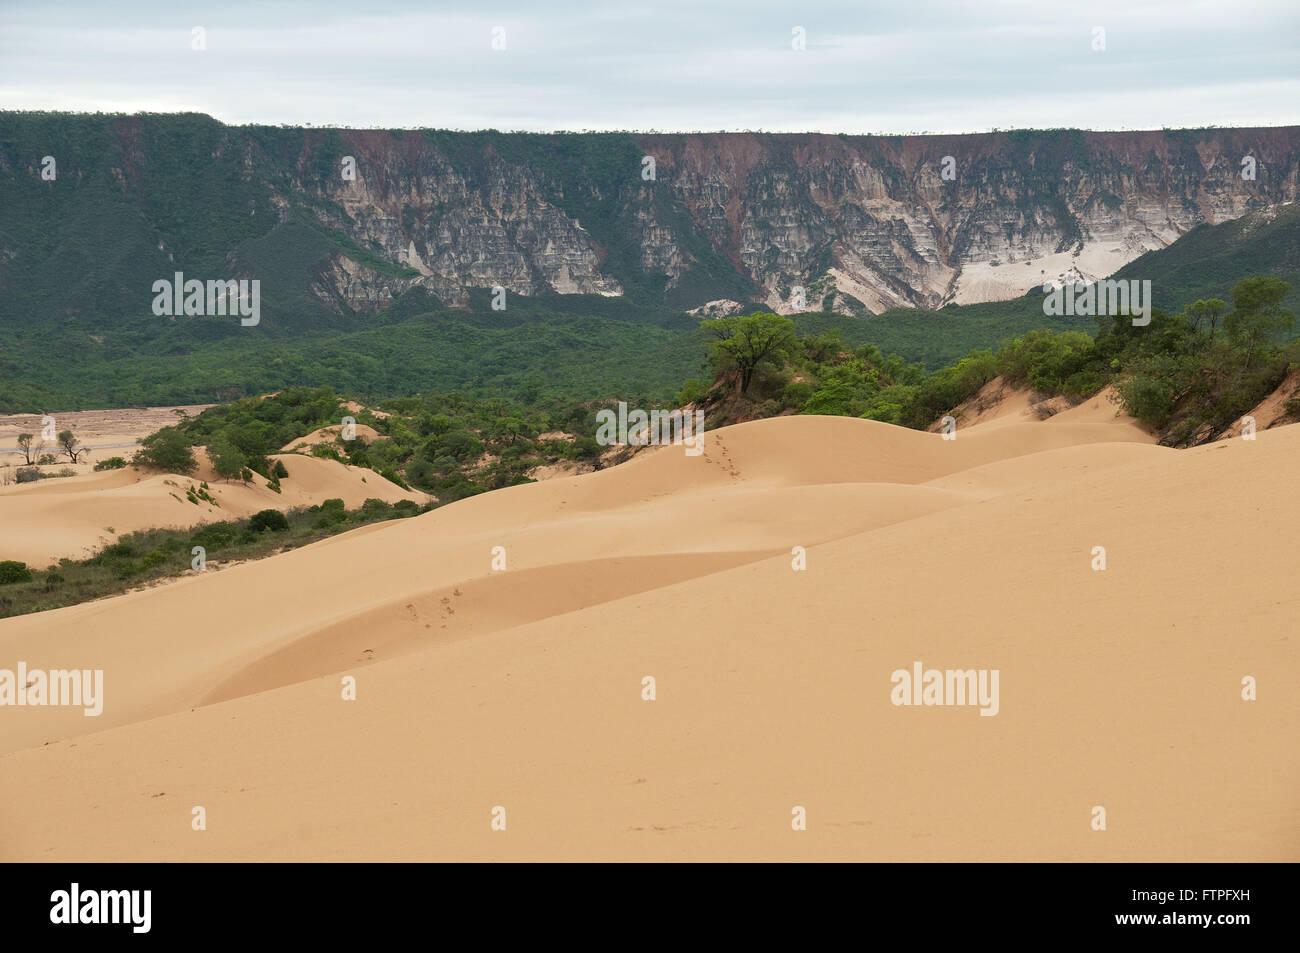 Dunes Jalapao the city of Bushmen - Desert Jalapao - Stock Image